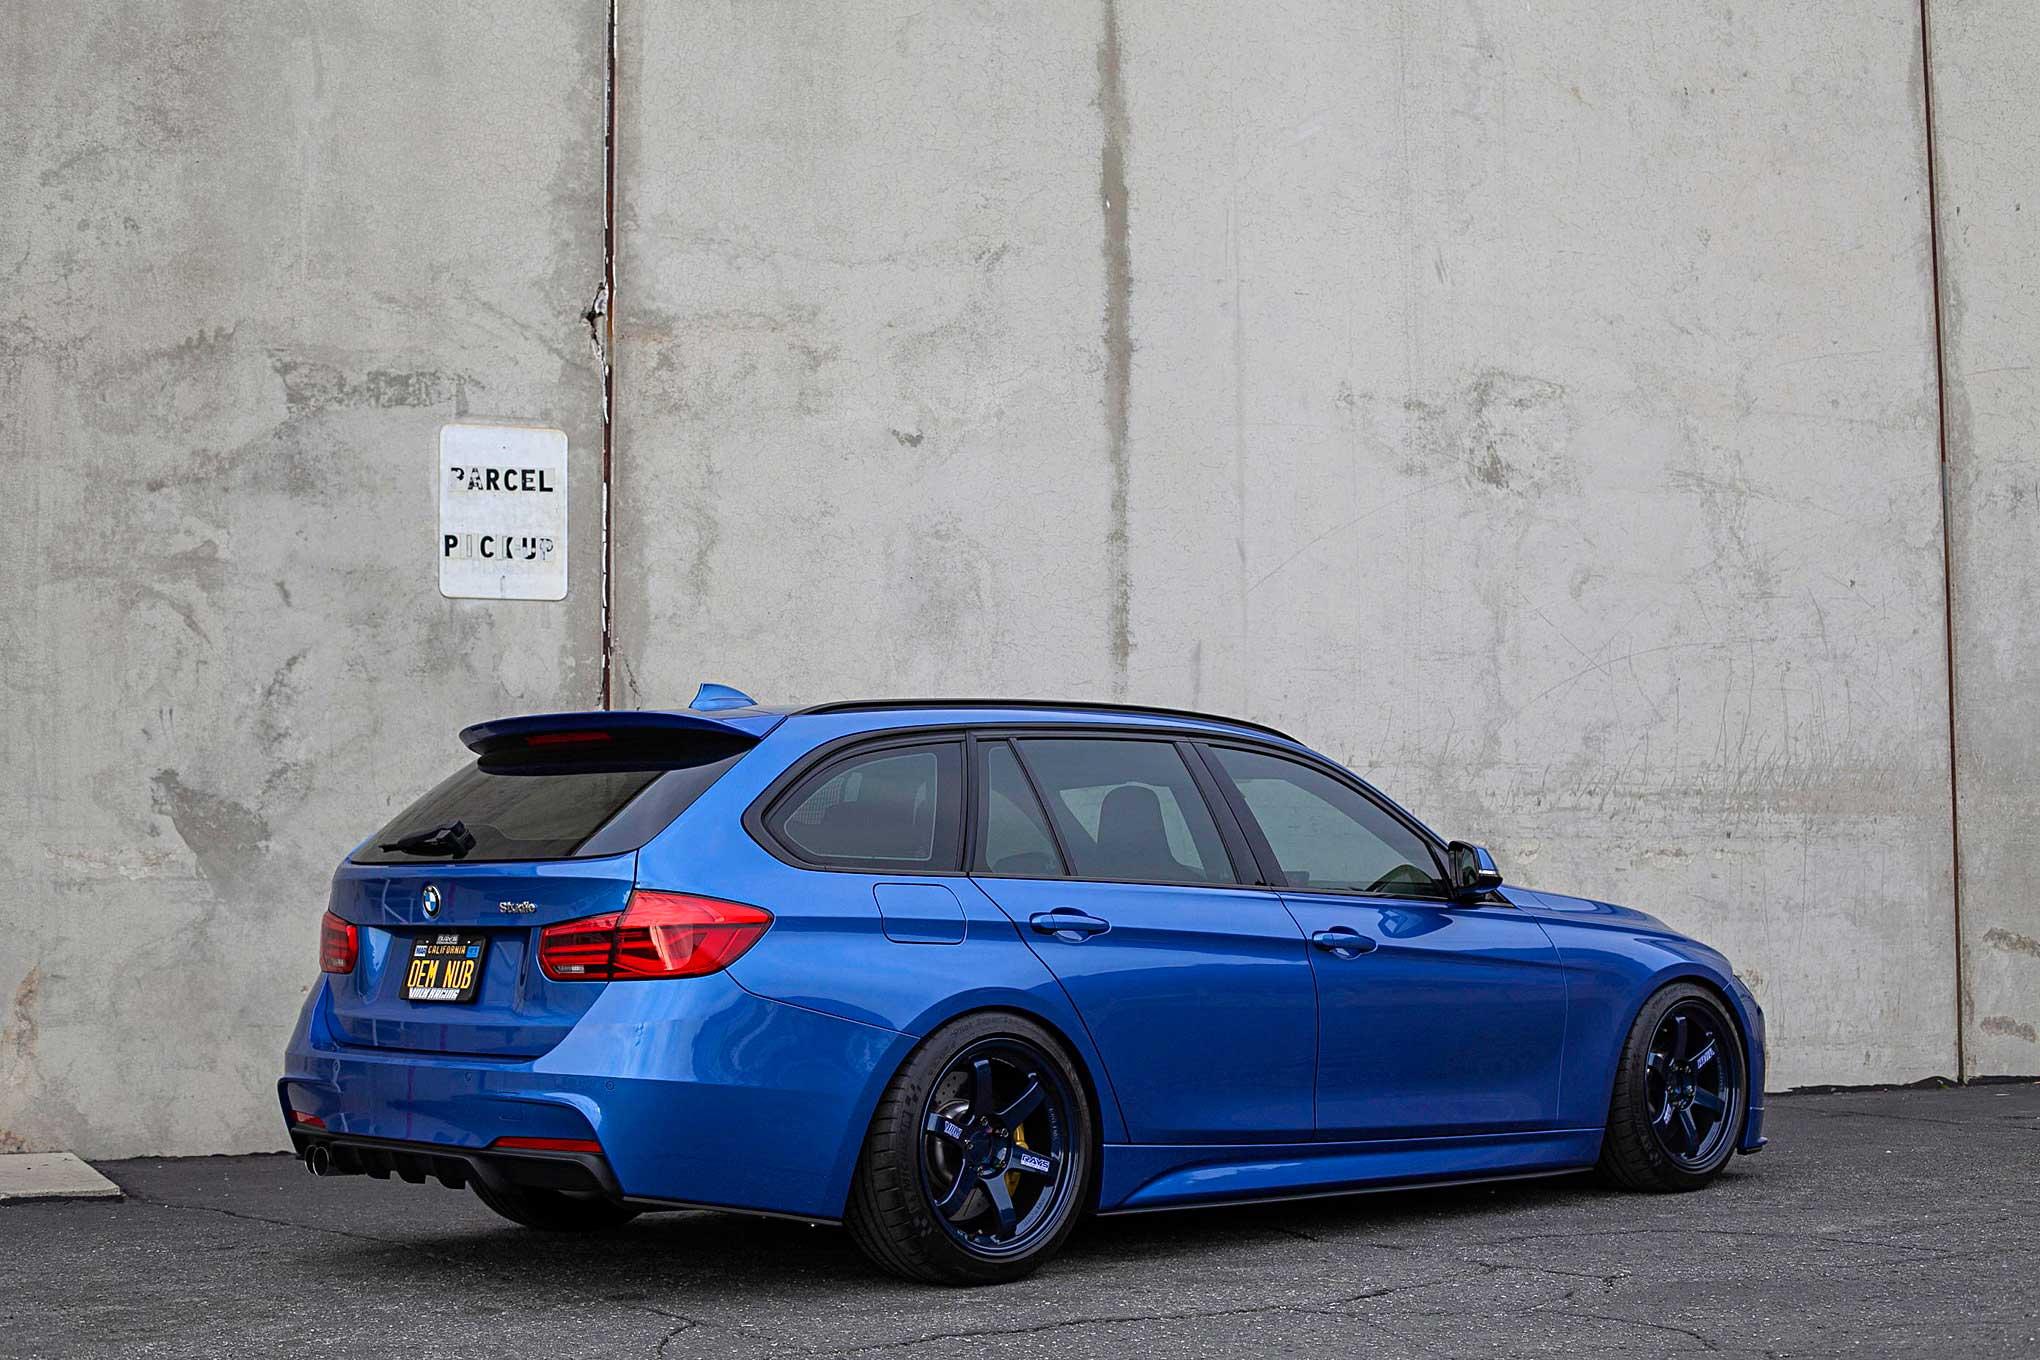 2014 BMW 328d M Sport - Family Man